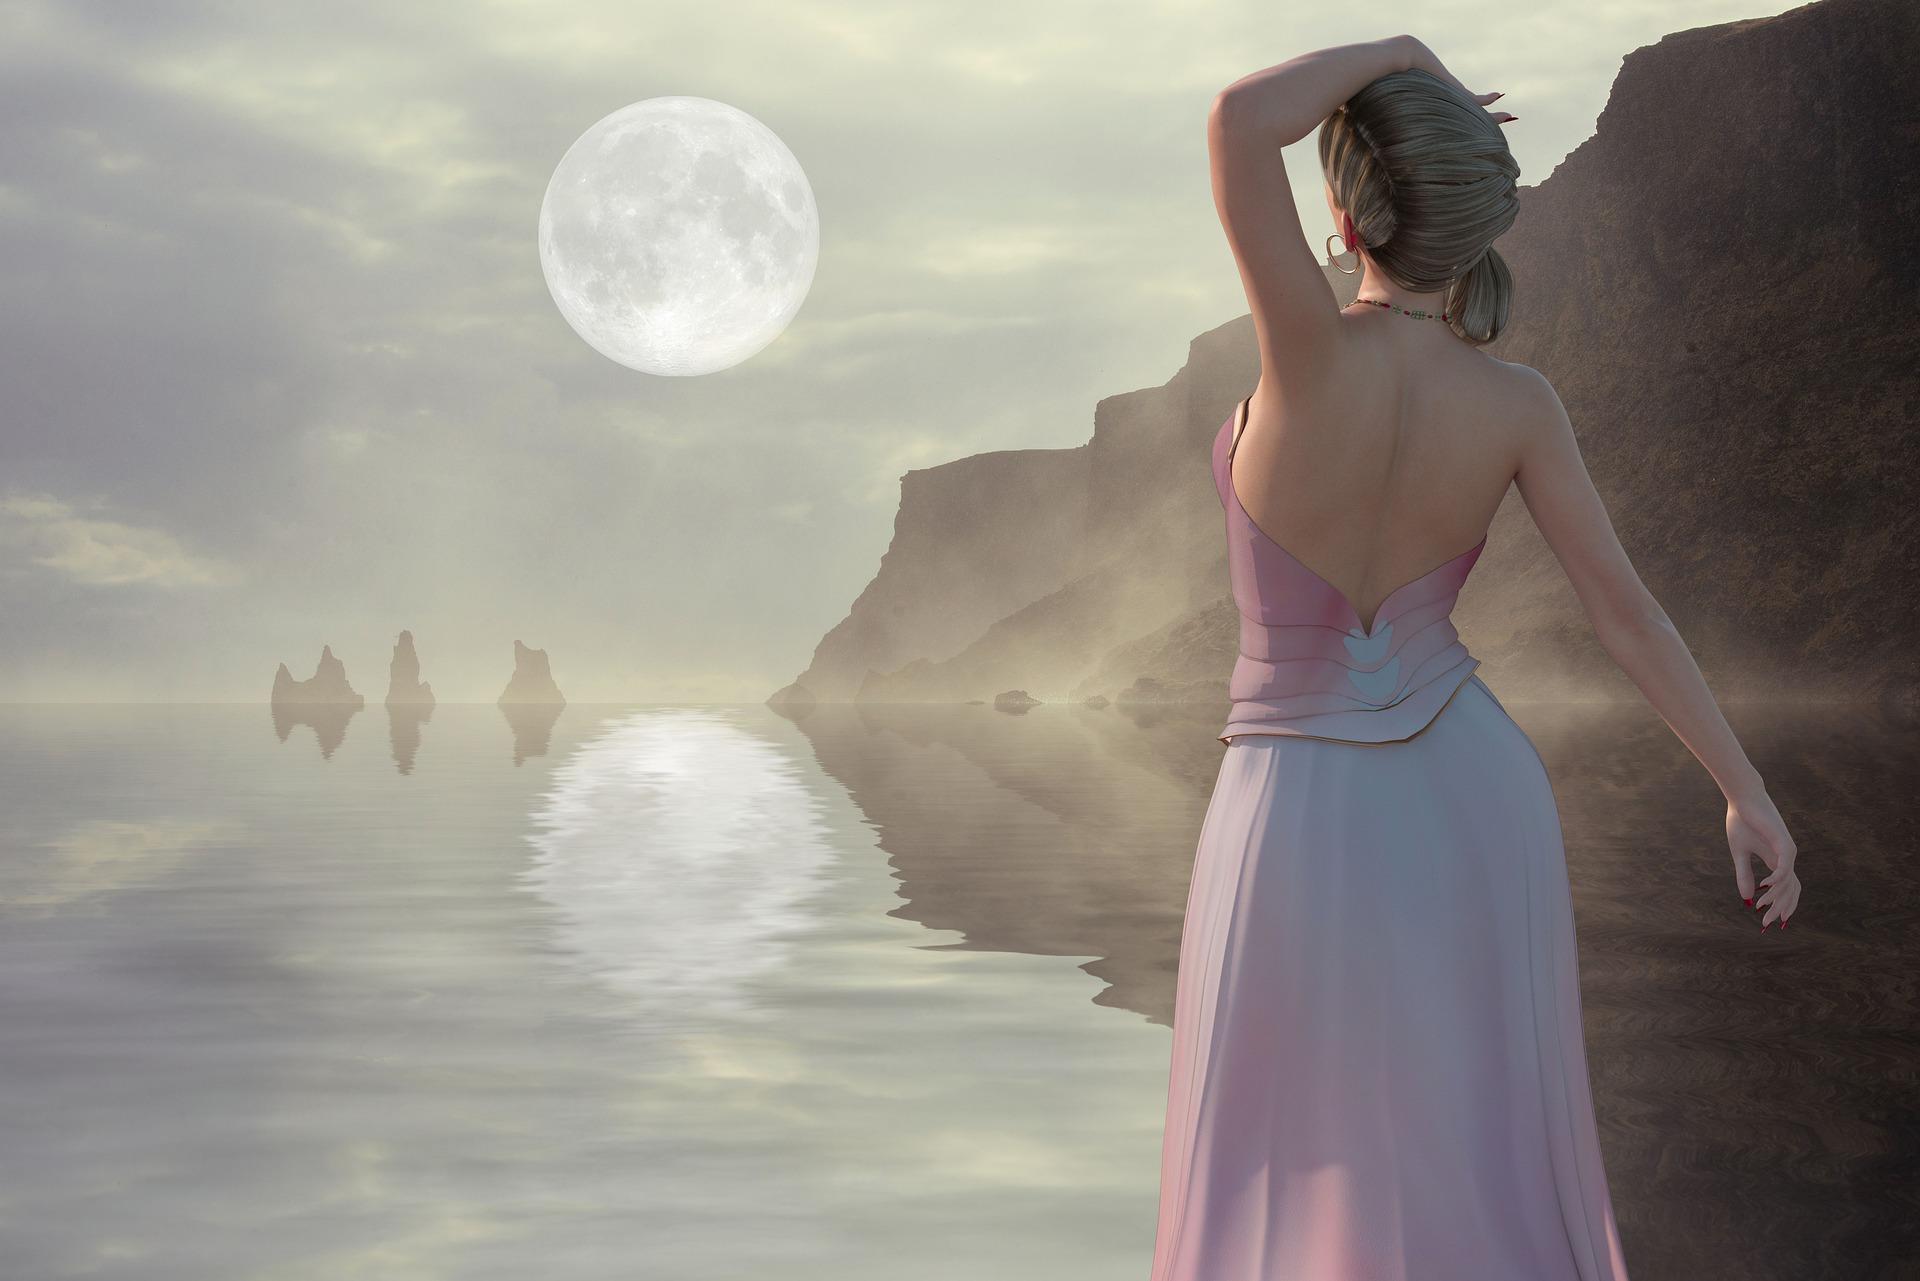 https://1.bp.blogspot.com/-qVgzWBVQdFA/YPaaal9MUDI/AAAAAAAAGdI/6Y3eTT2BzcwT0RNa3fRBmIFtXdnlp1MuQCPcBGAYYCw/s1920/the-moon-and-the-goddess.jpg